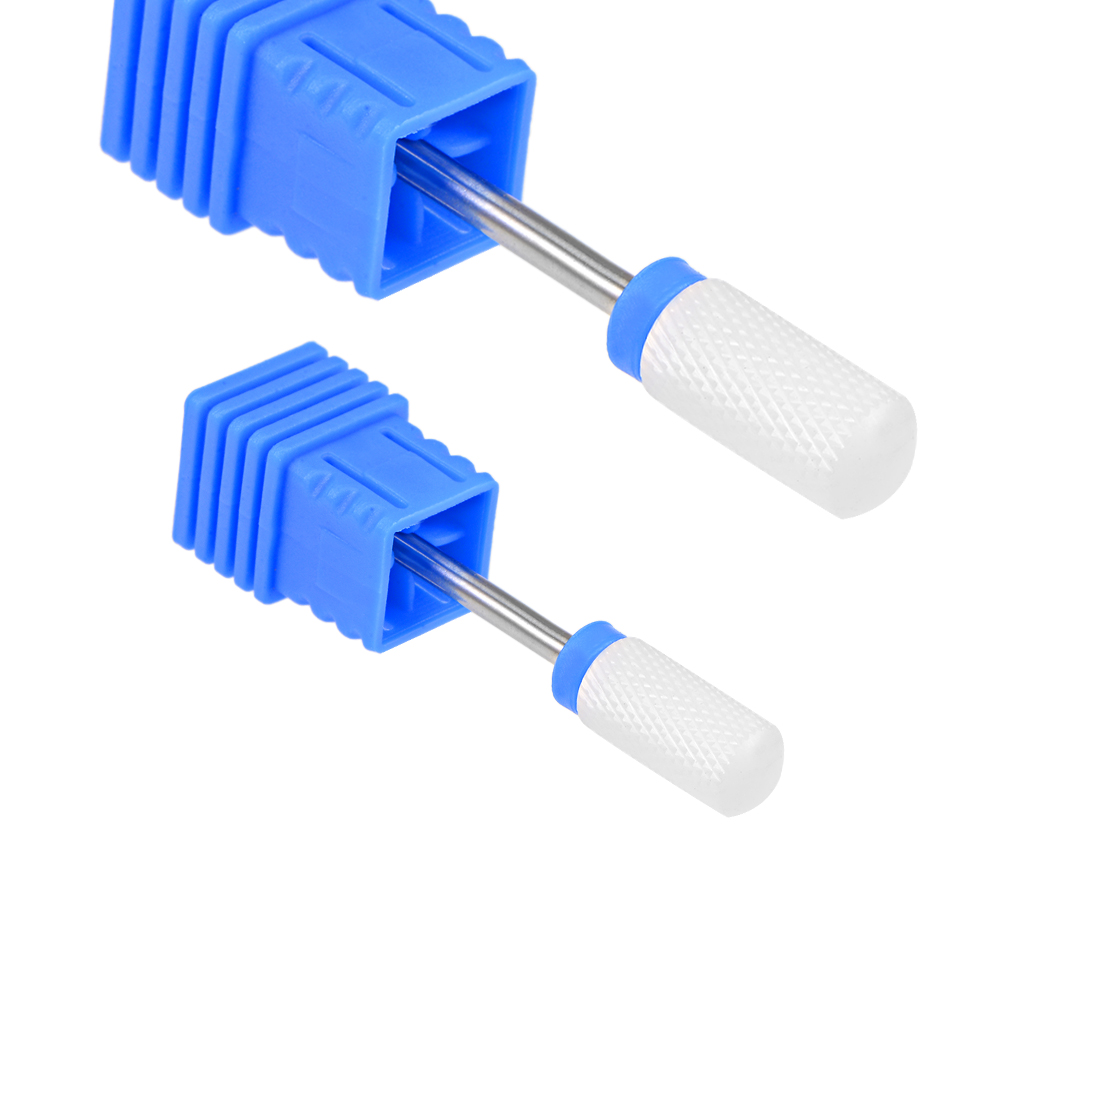 "2pcs Ceramic Nail Drill Bits 3/32"" (Medium Grit) Acrylic Nails File Bit Blue"